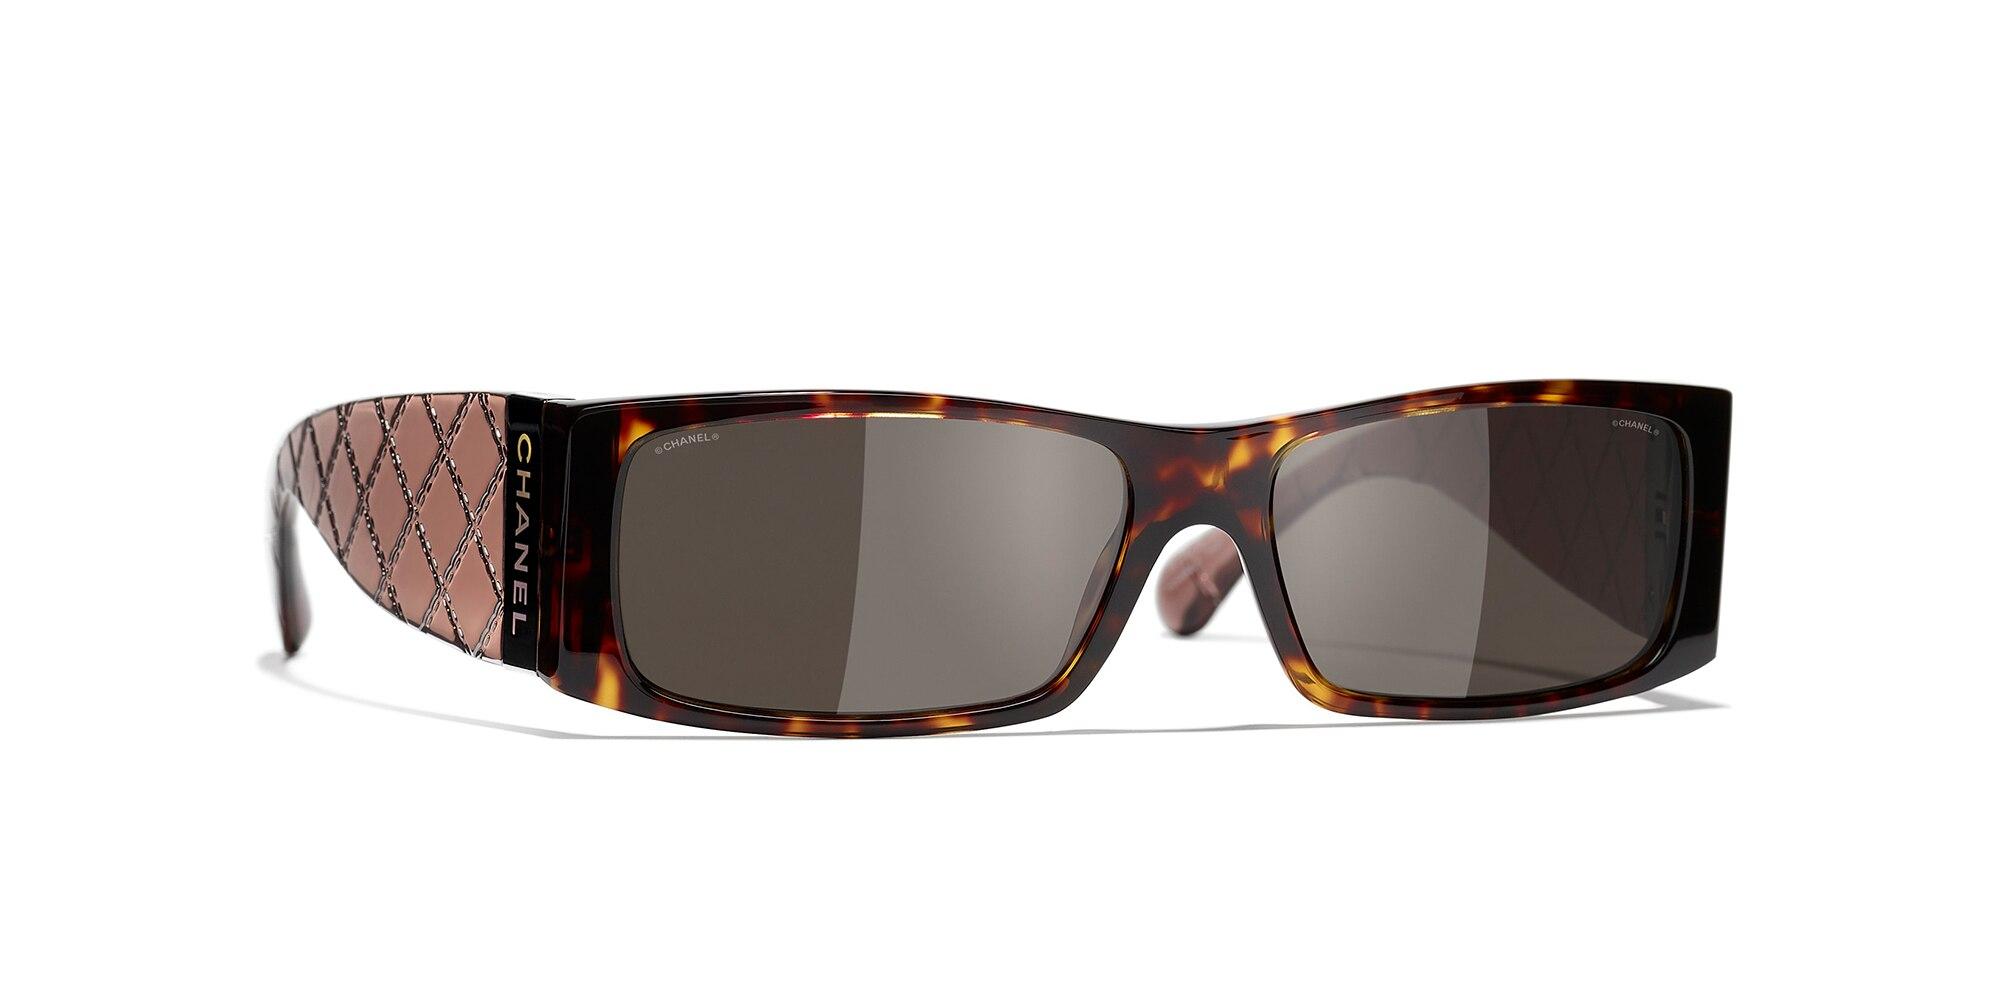 Chanel Unisex  Rectangle Sunglasses CH5425 -  Frame color: Tortuga oscuro, Lens color: Marron